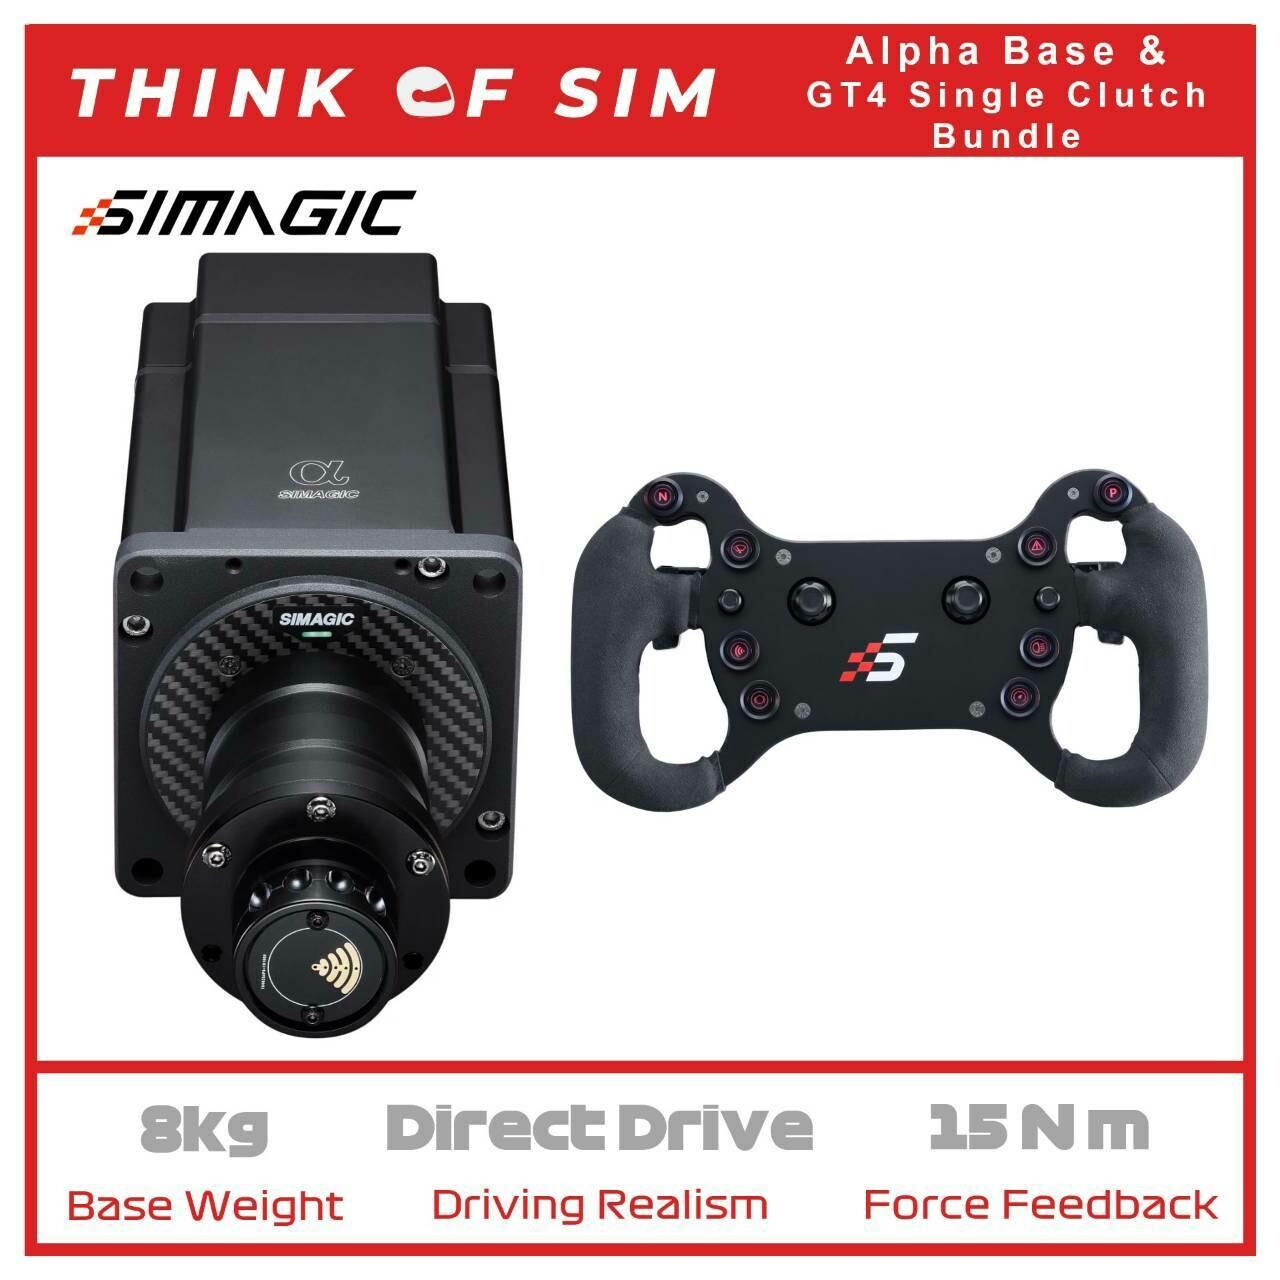 Simagic Alpha Flagship Direct Drive Base for Sim Racing+GT4 Single Clutch